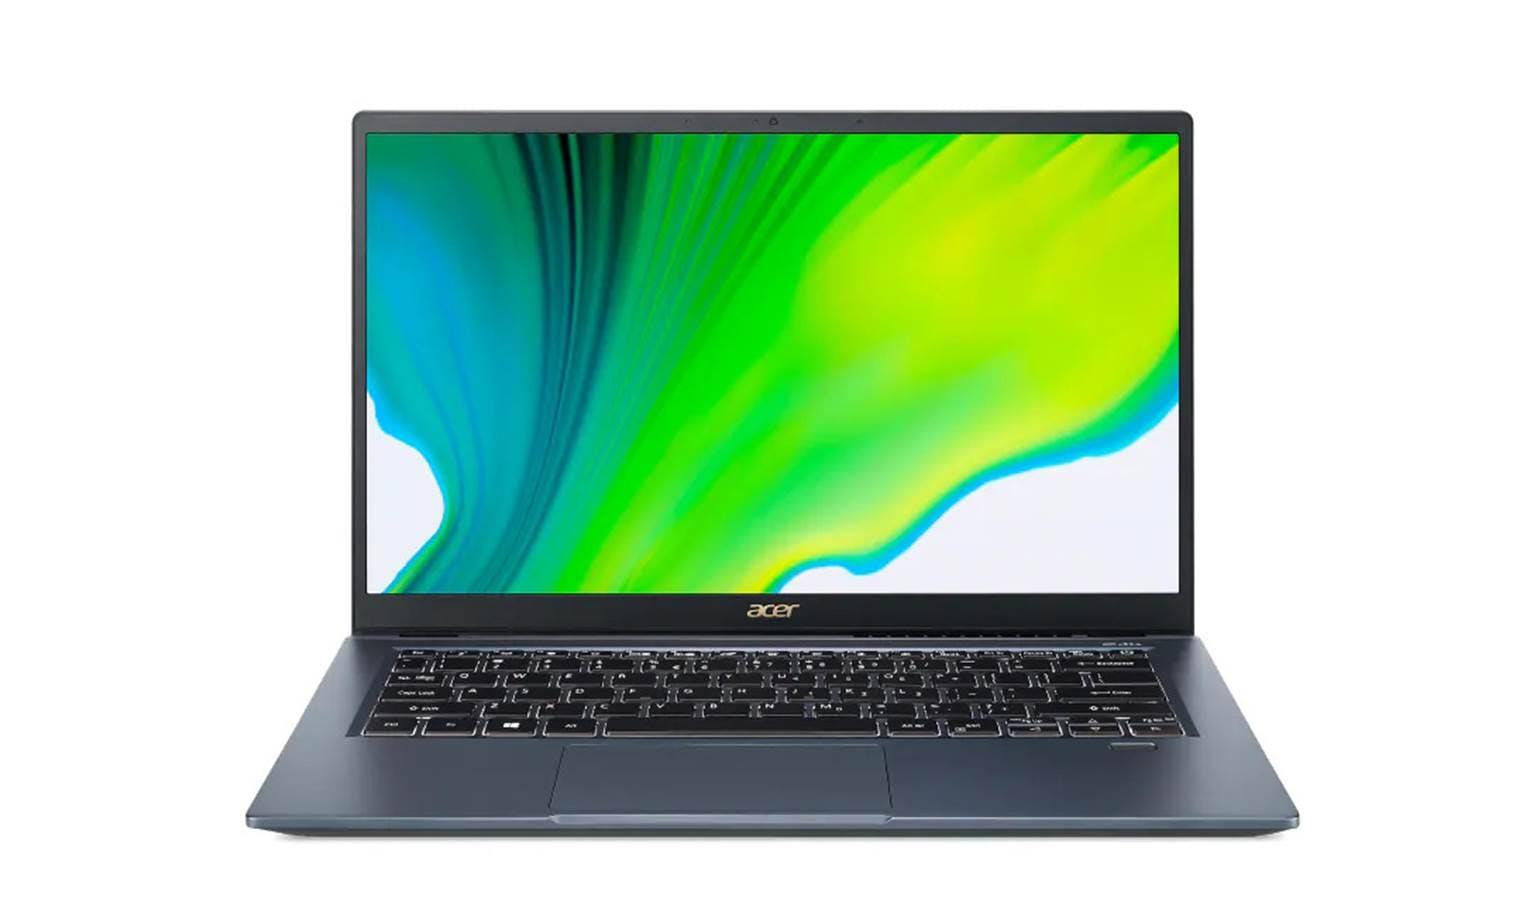 Acer Swift 3x (Core i5, 8GB/512GB, Windows 10) 14-inch Laptop - Blue